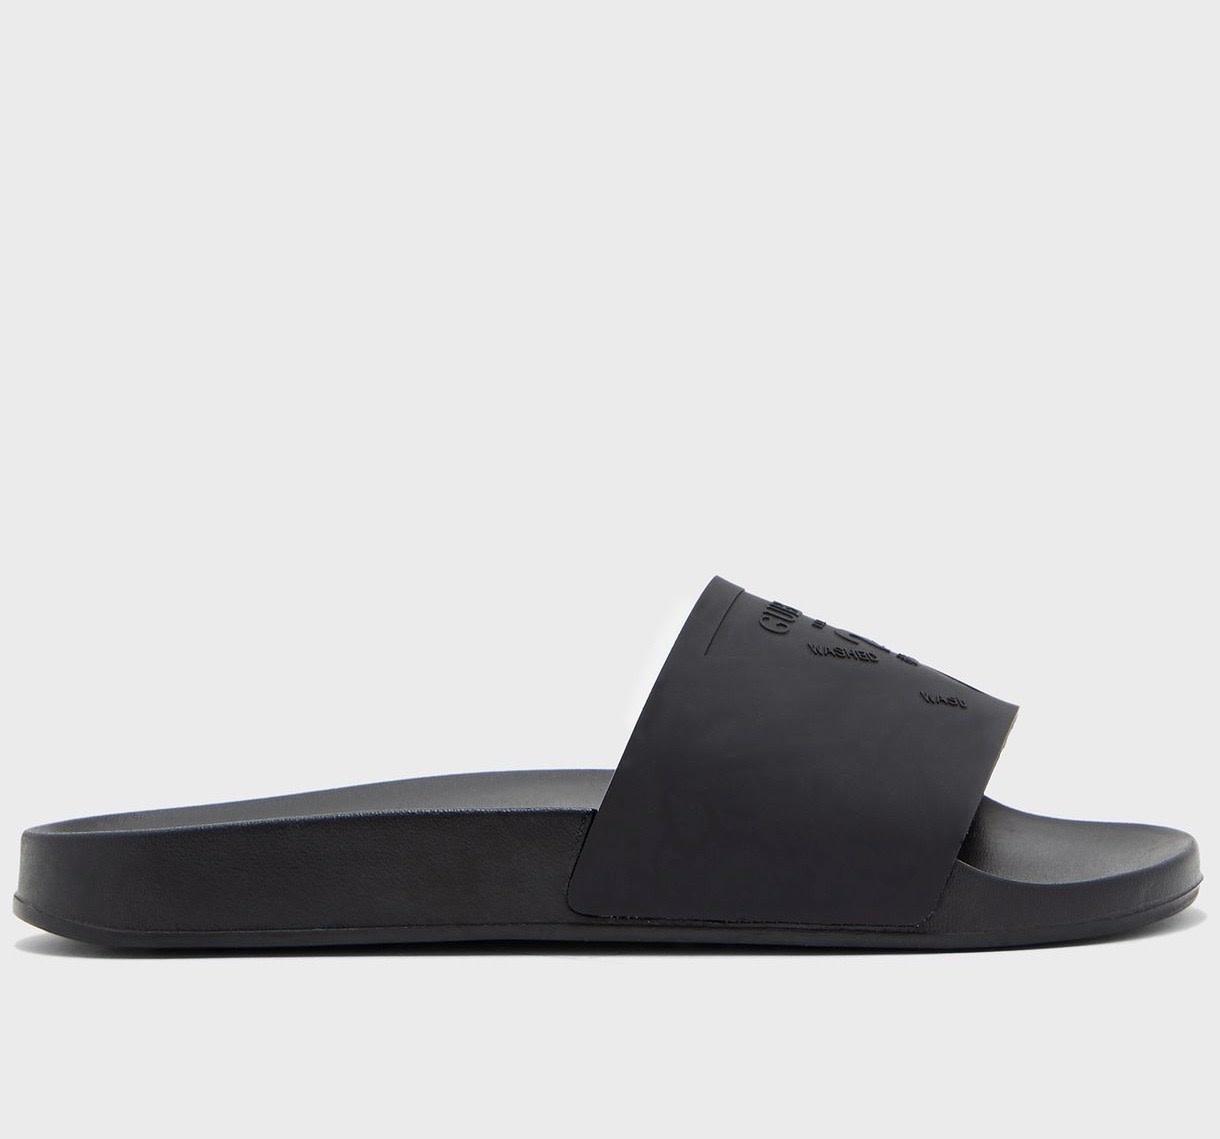 "GUESS FOOTWEAR GUESS? ""SACHI"" Slide Sandal"